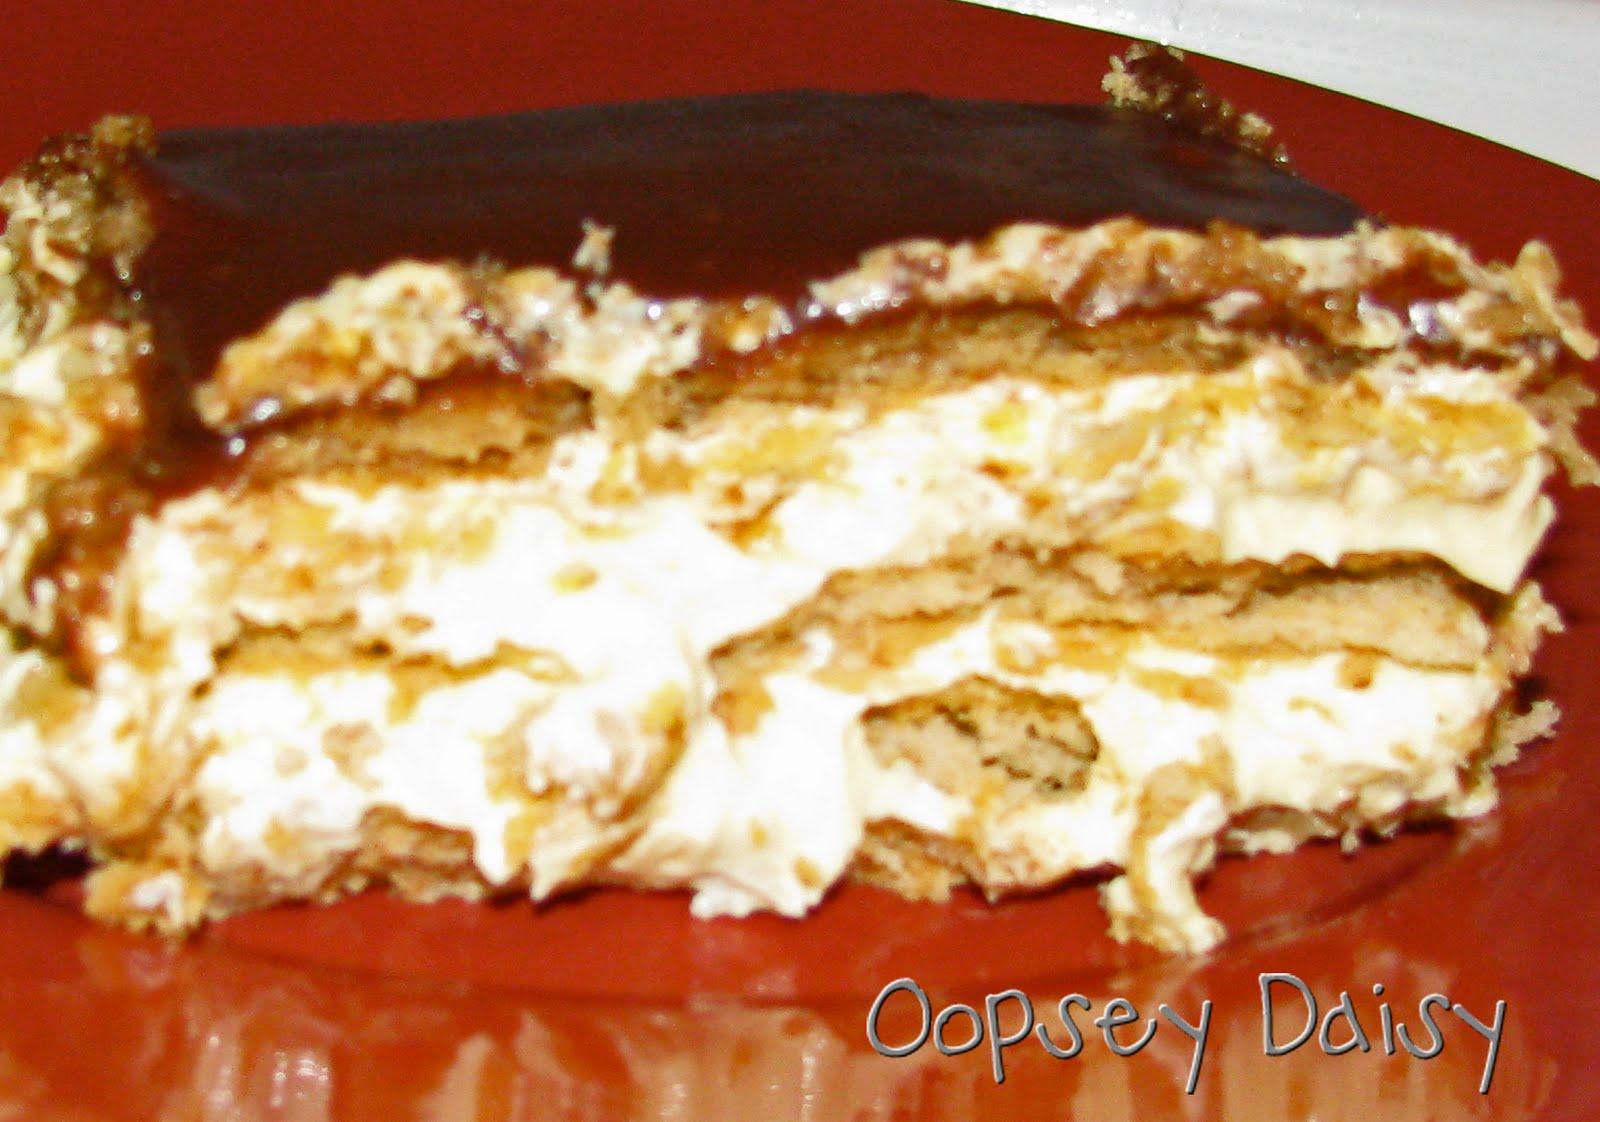 Chocolate Eclair Cake {Yum!} | Oopsey Daisy